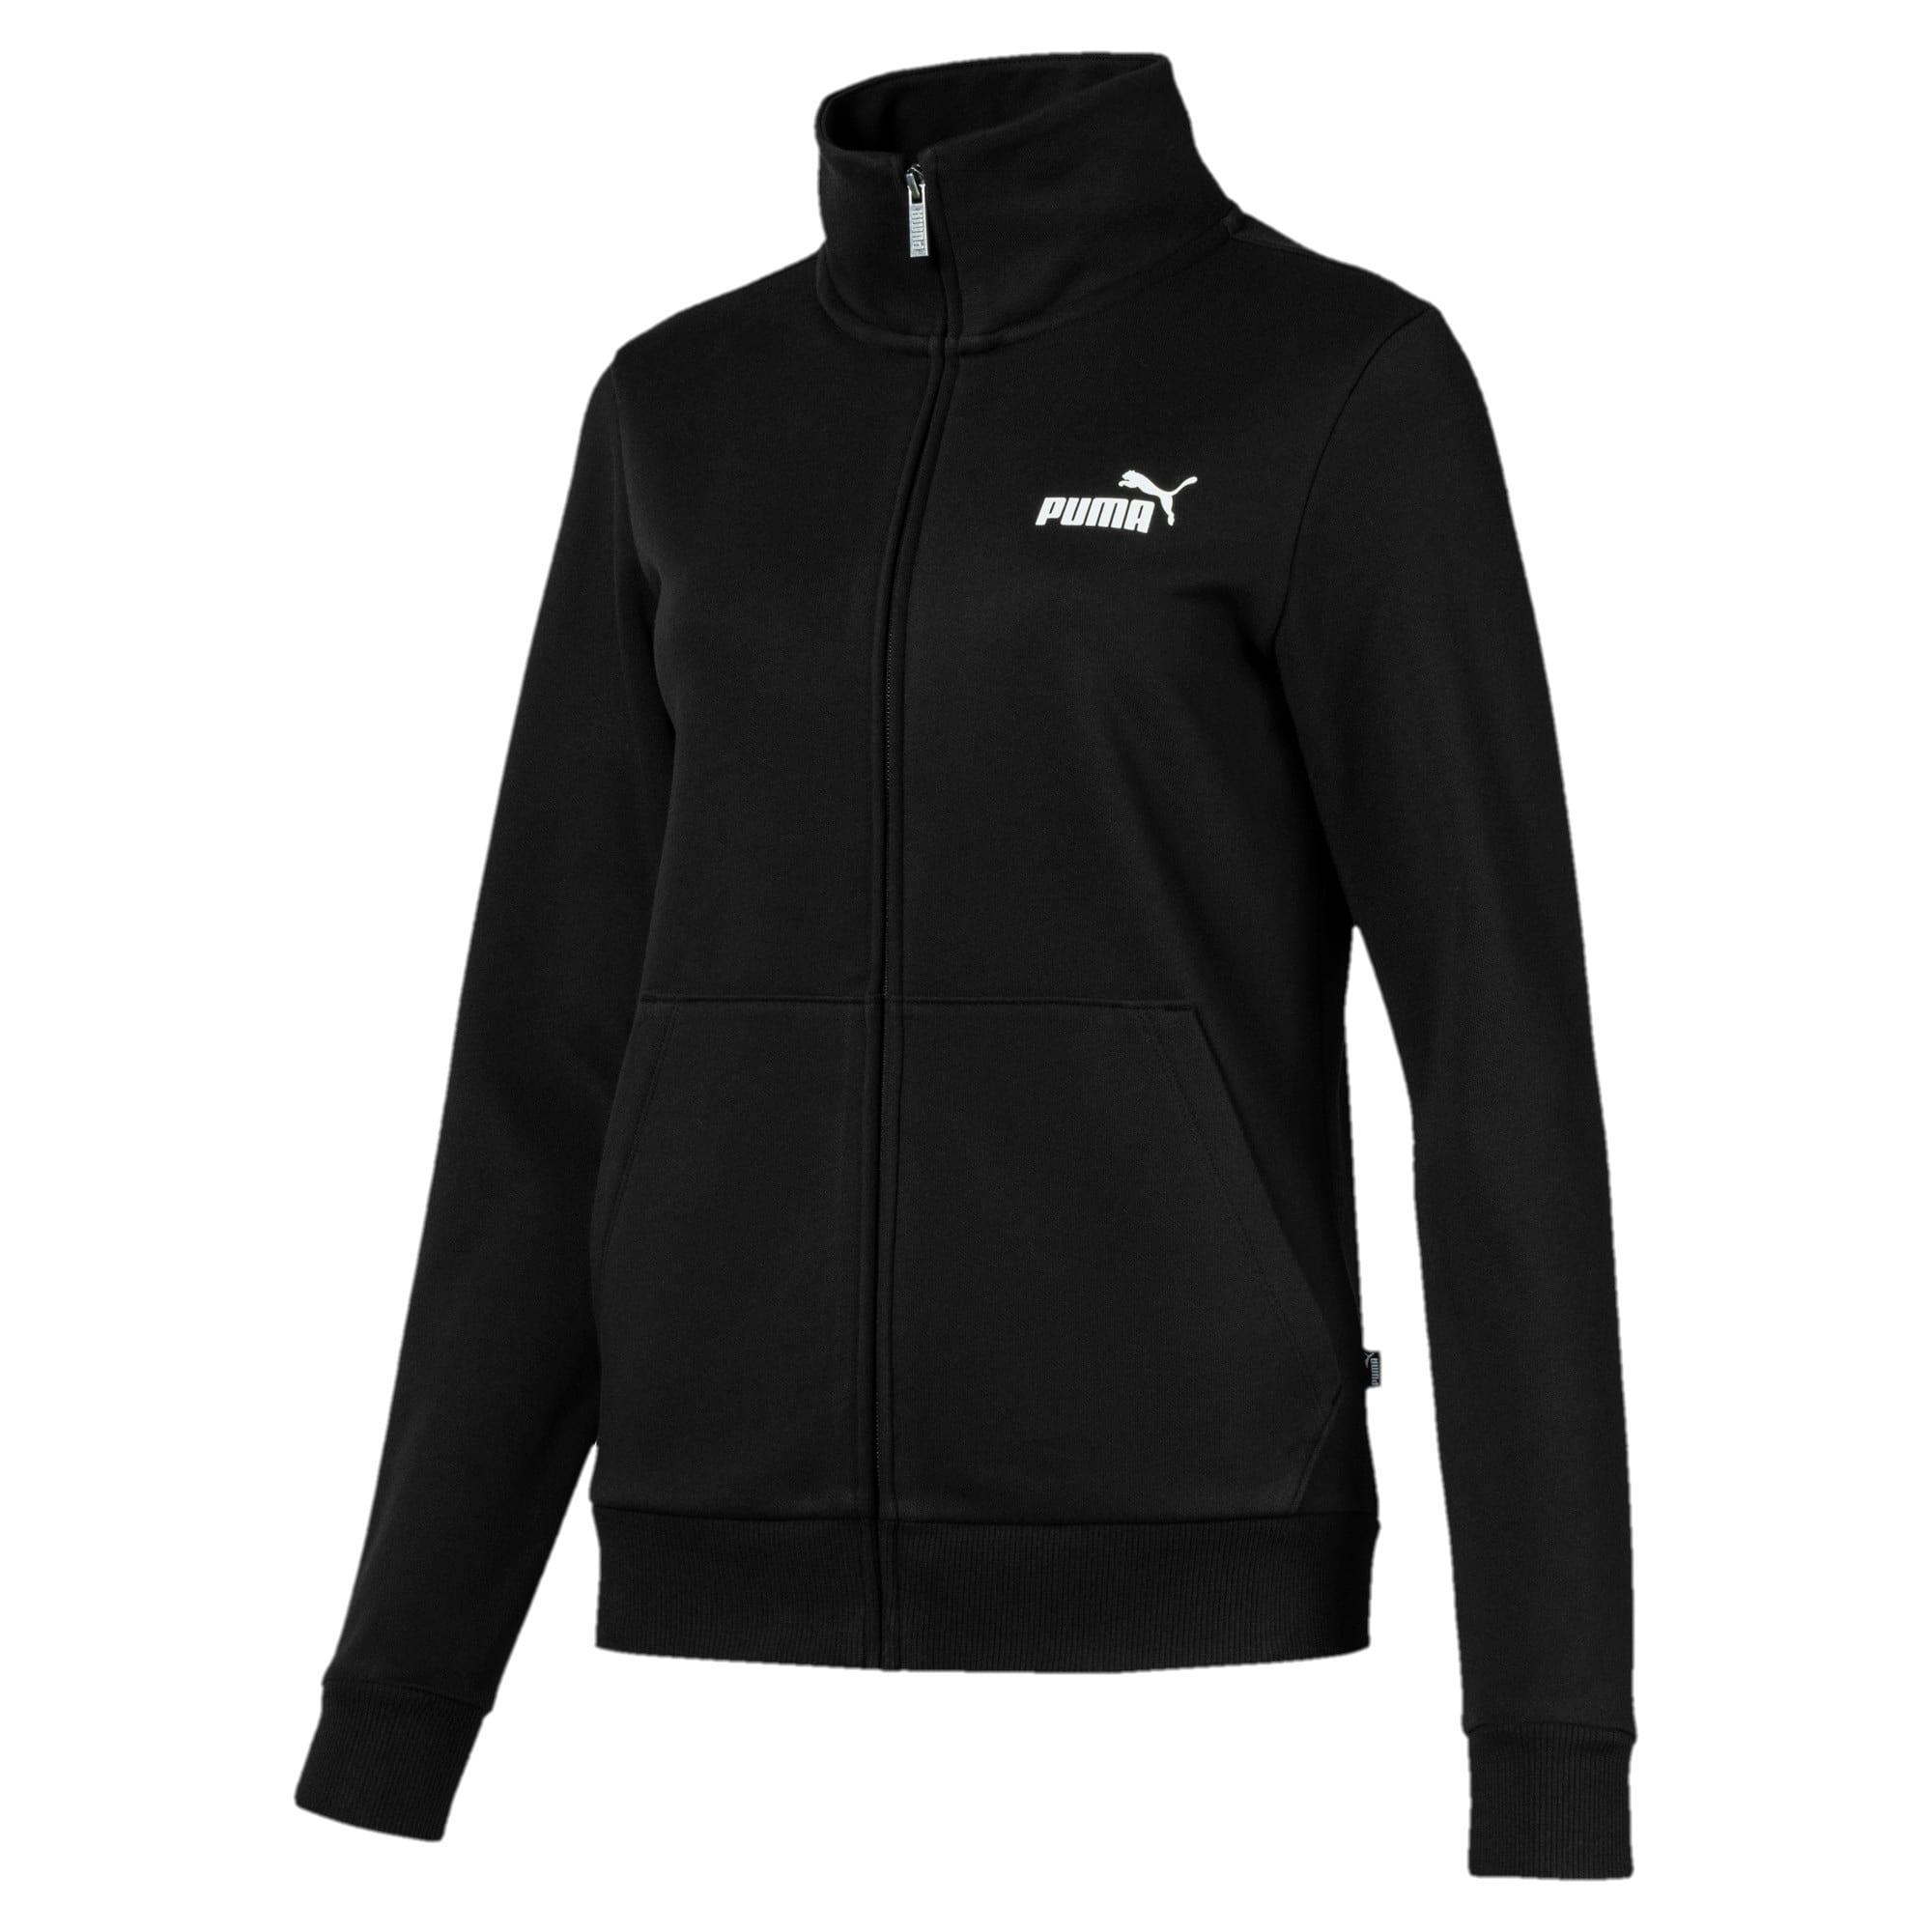 Thumbnail 1 of Essentials Fleece Women's Track Jacket, Cotton Black, medium